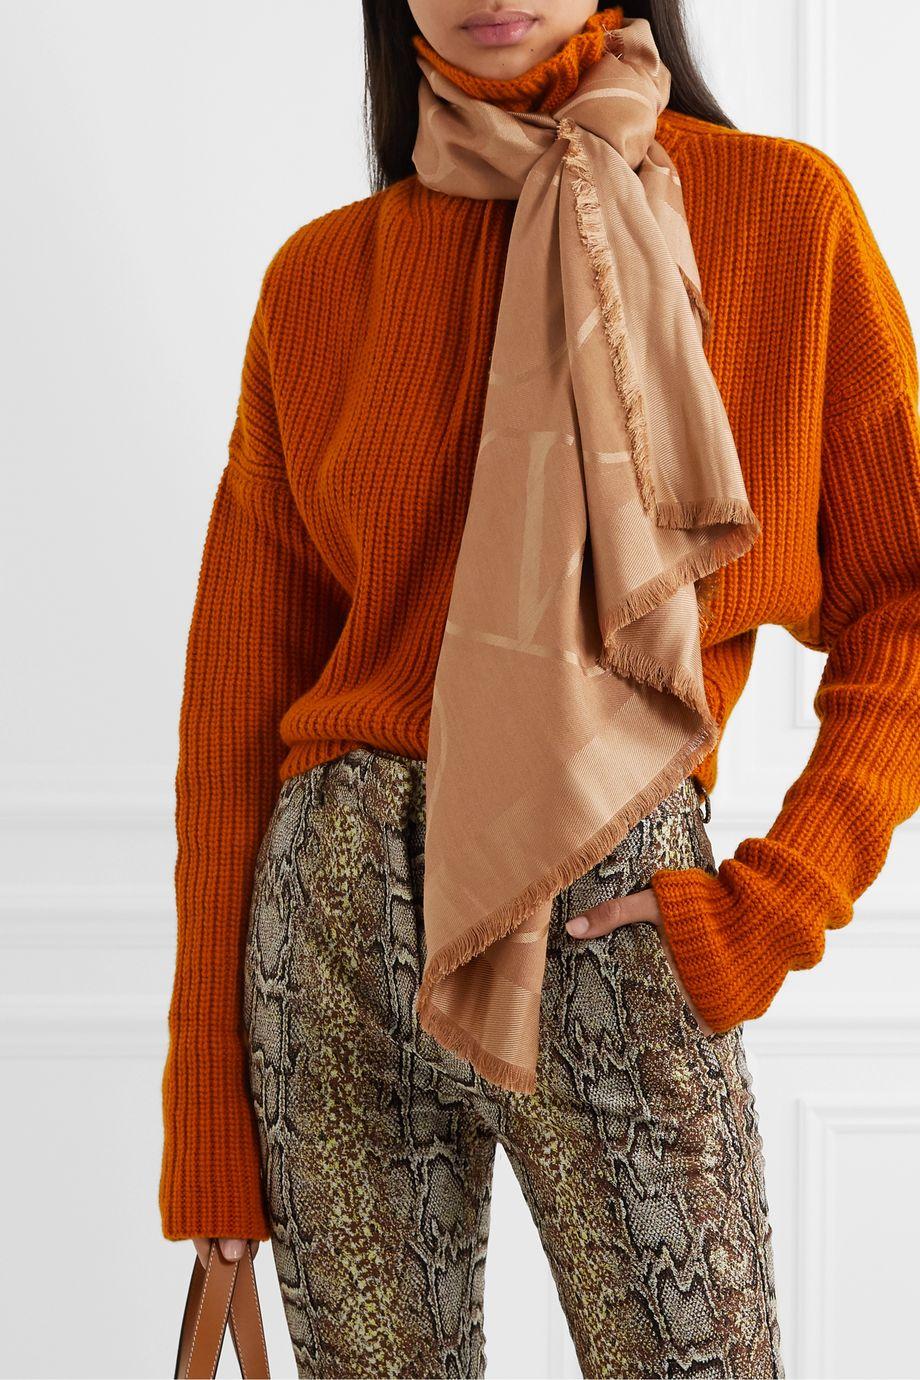 Valentino Valentino Garavani silk and wool-blend jacquard scarf